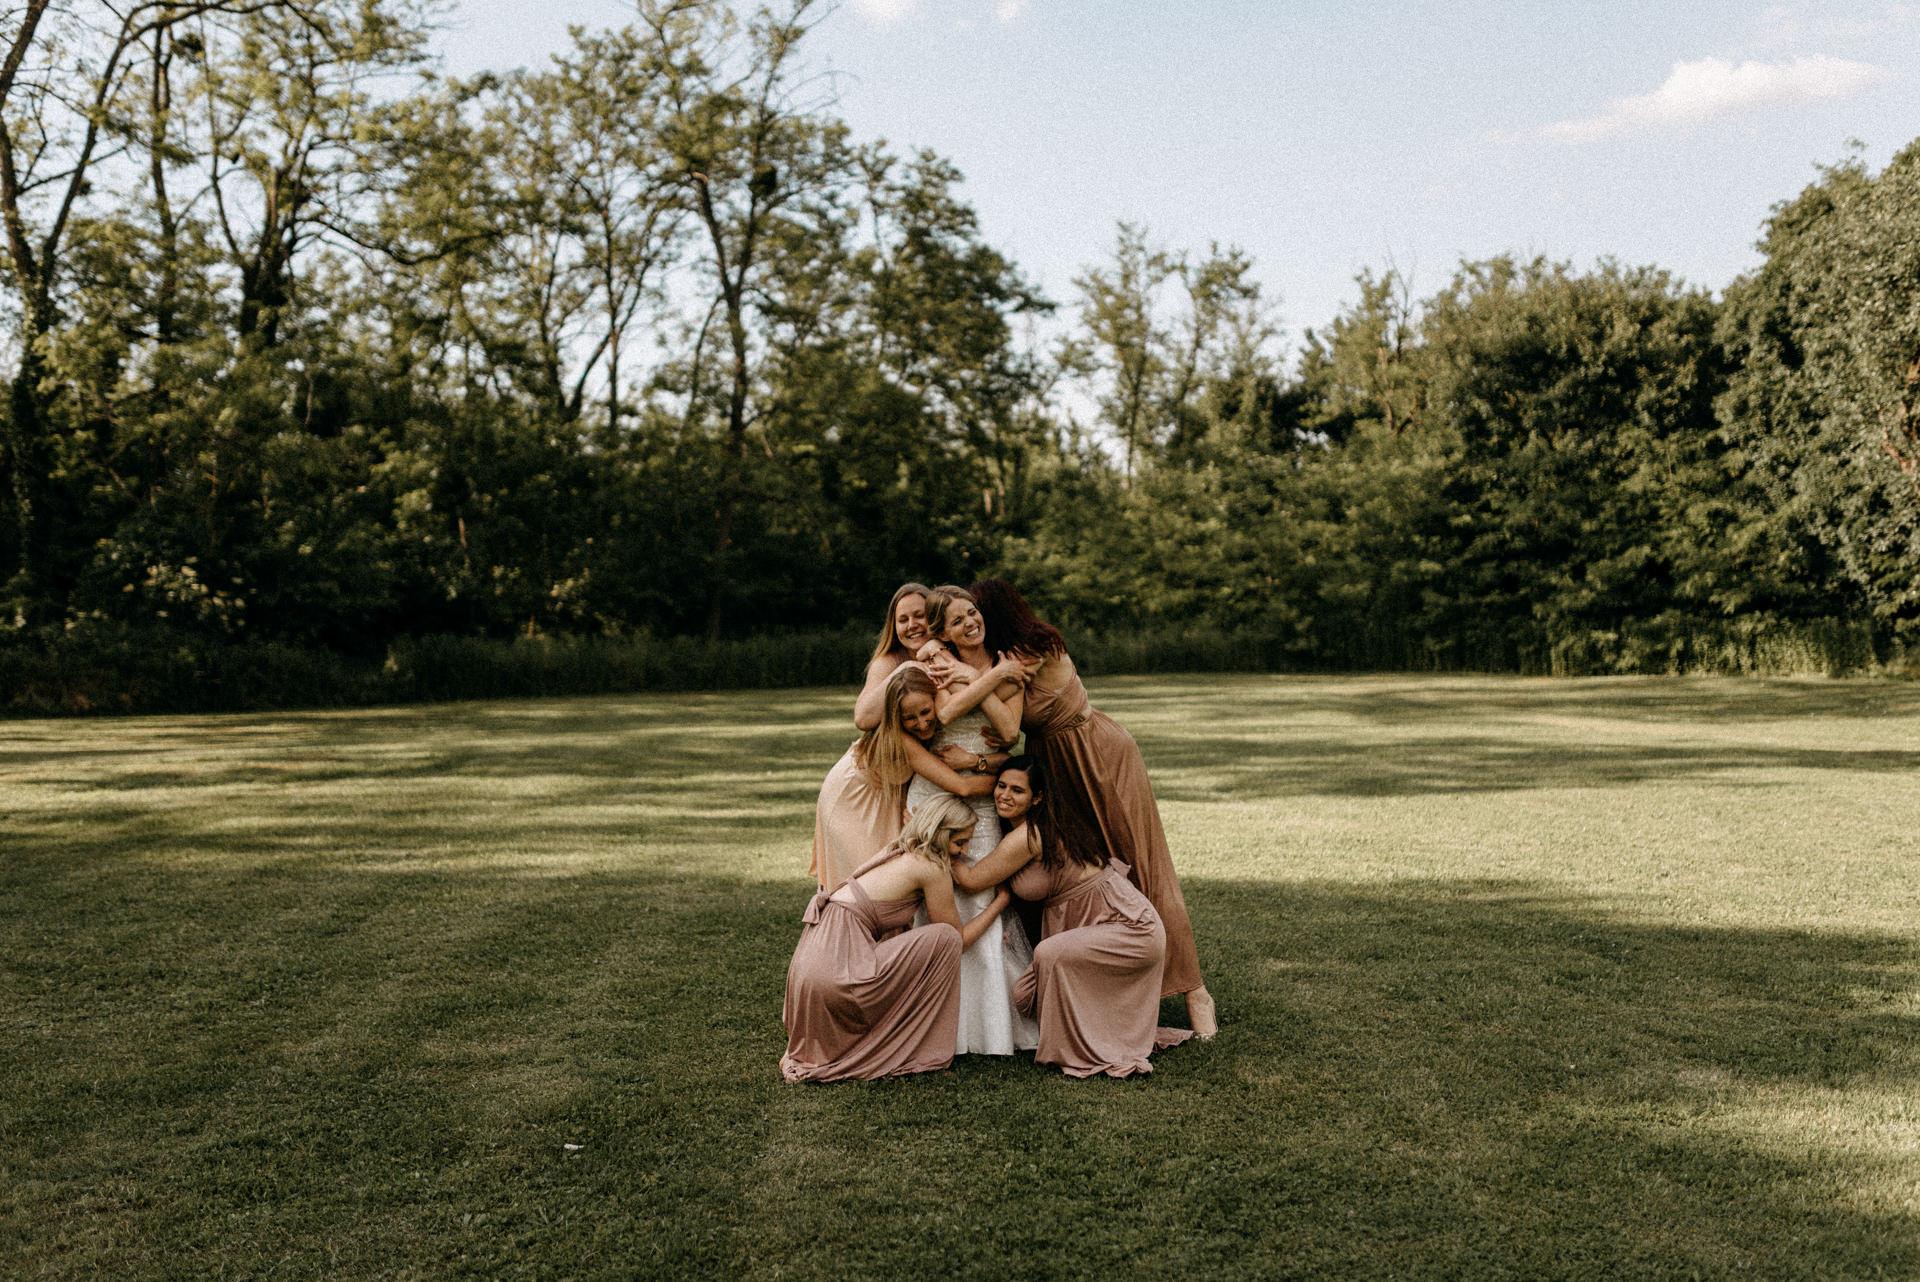 baberliget kuria eskuvo bridesmaids koszoruslanyok